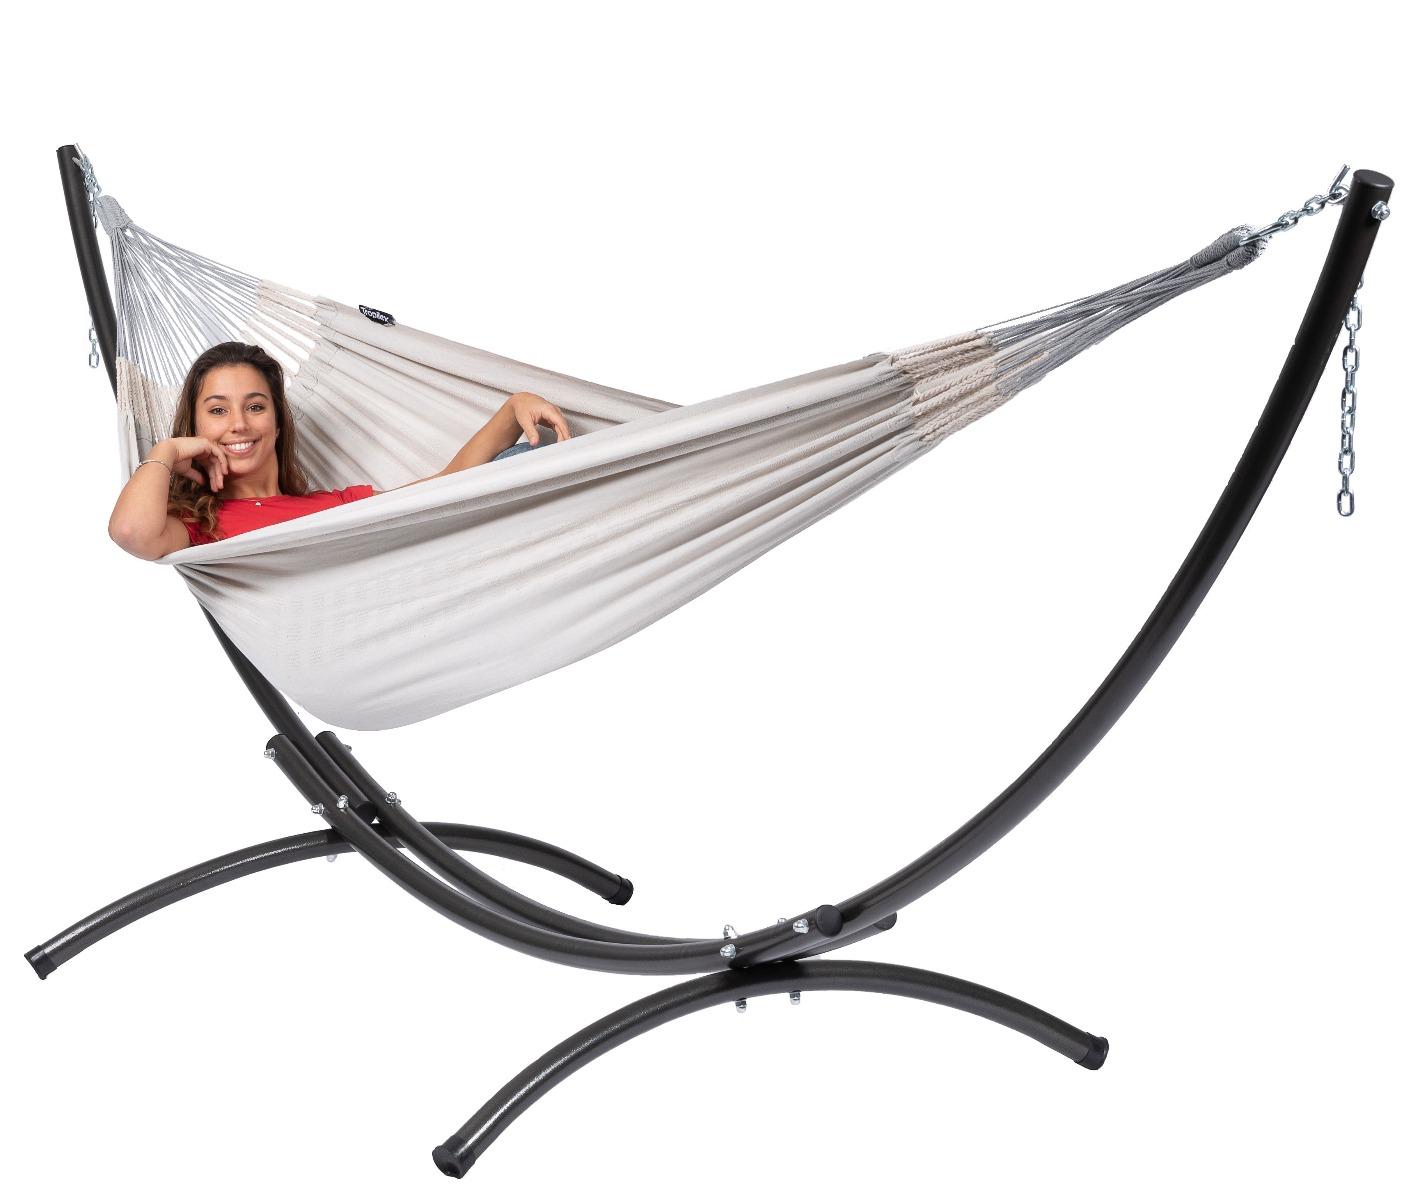 Hangmatset Double 'Arc & Comfort' Pearl - Tropilex �